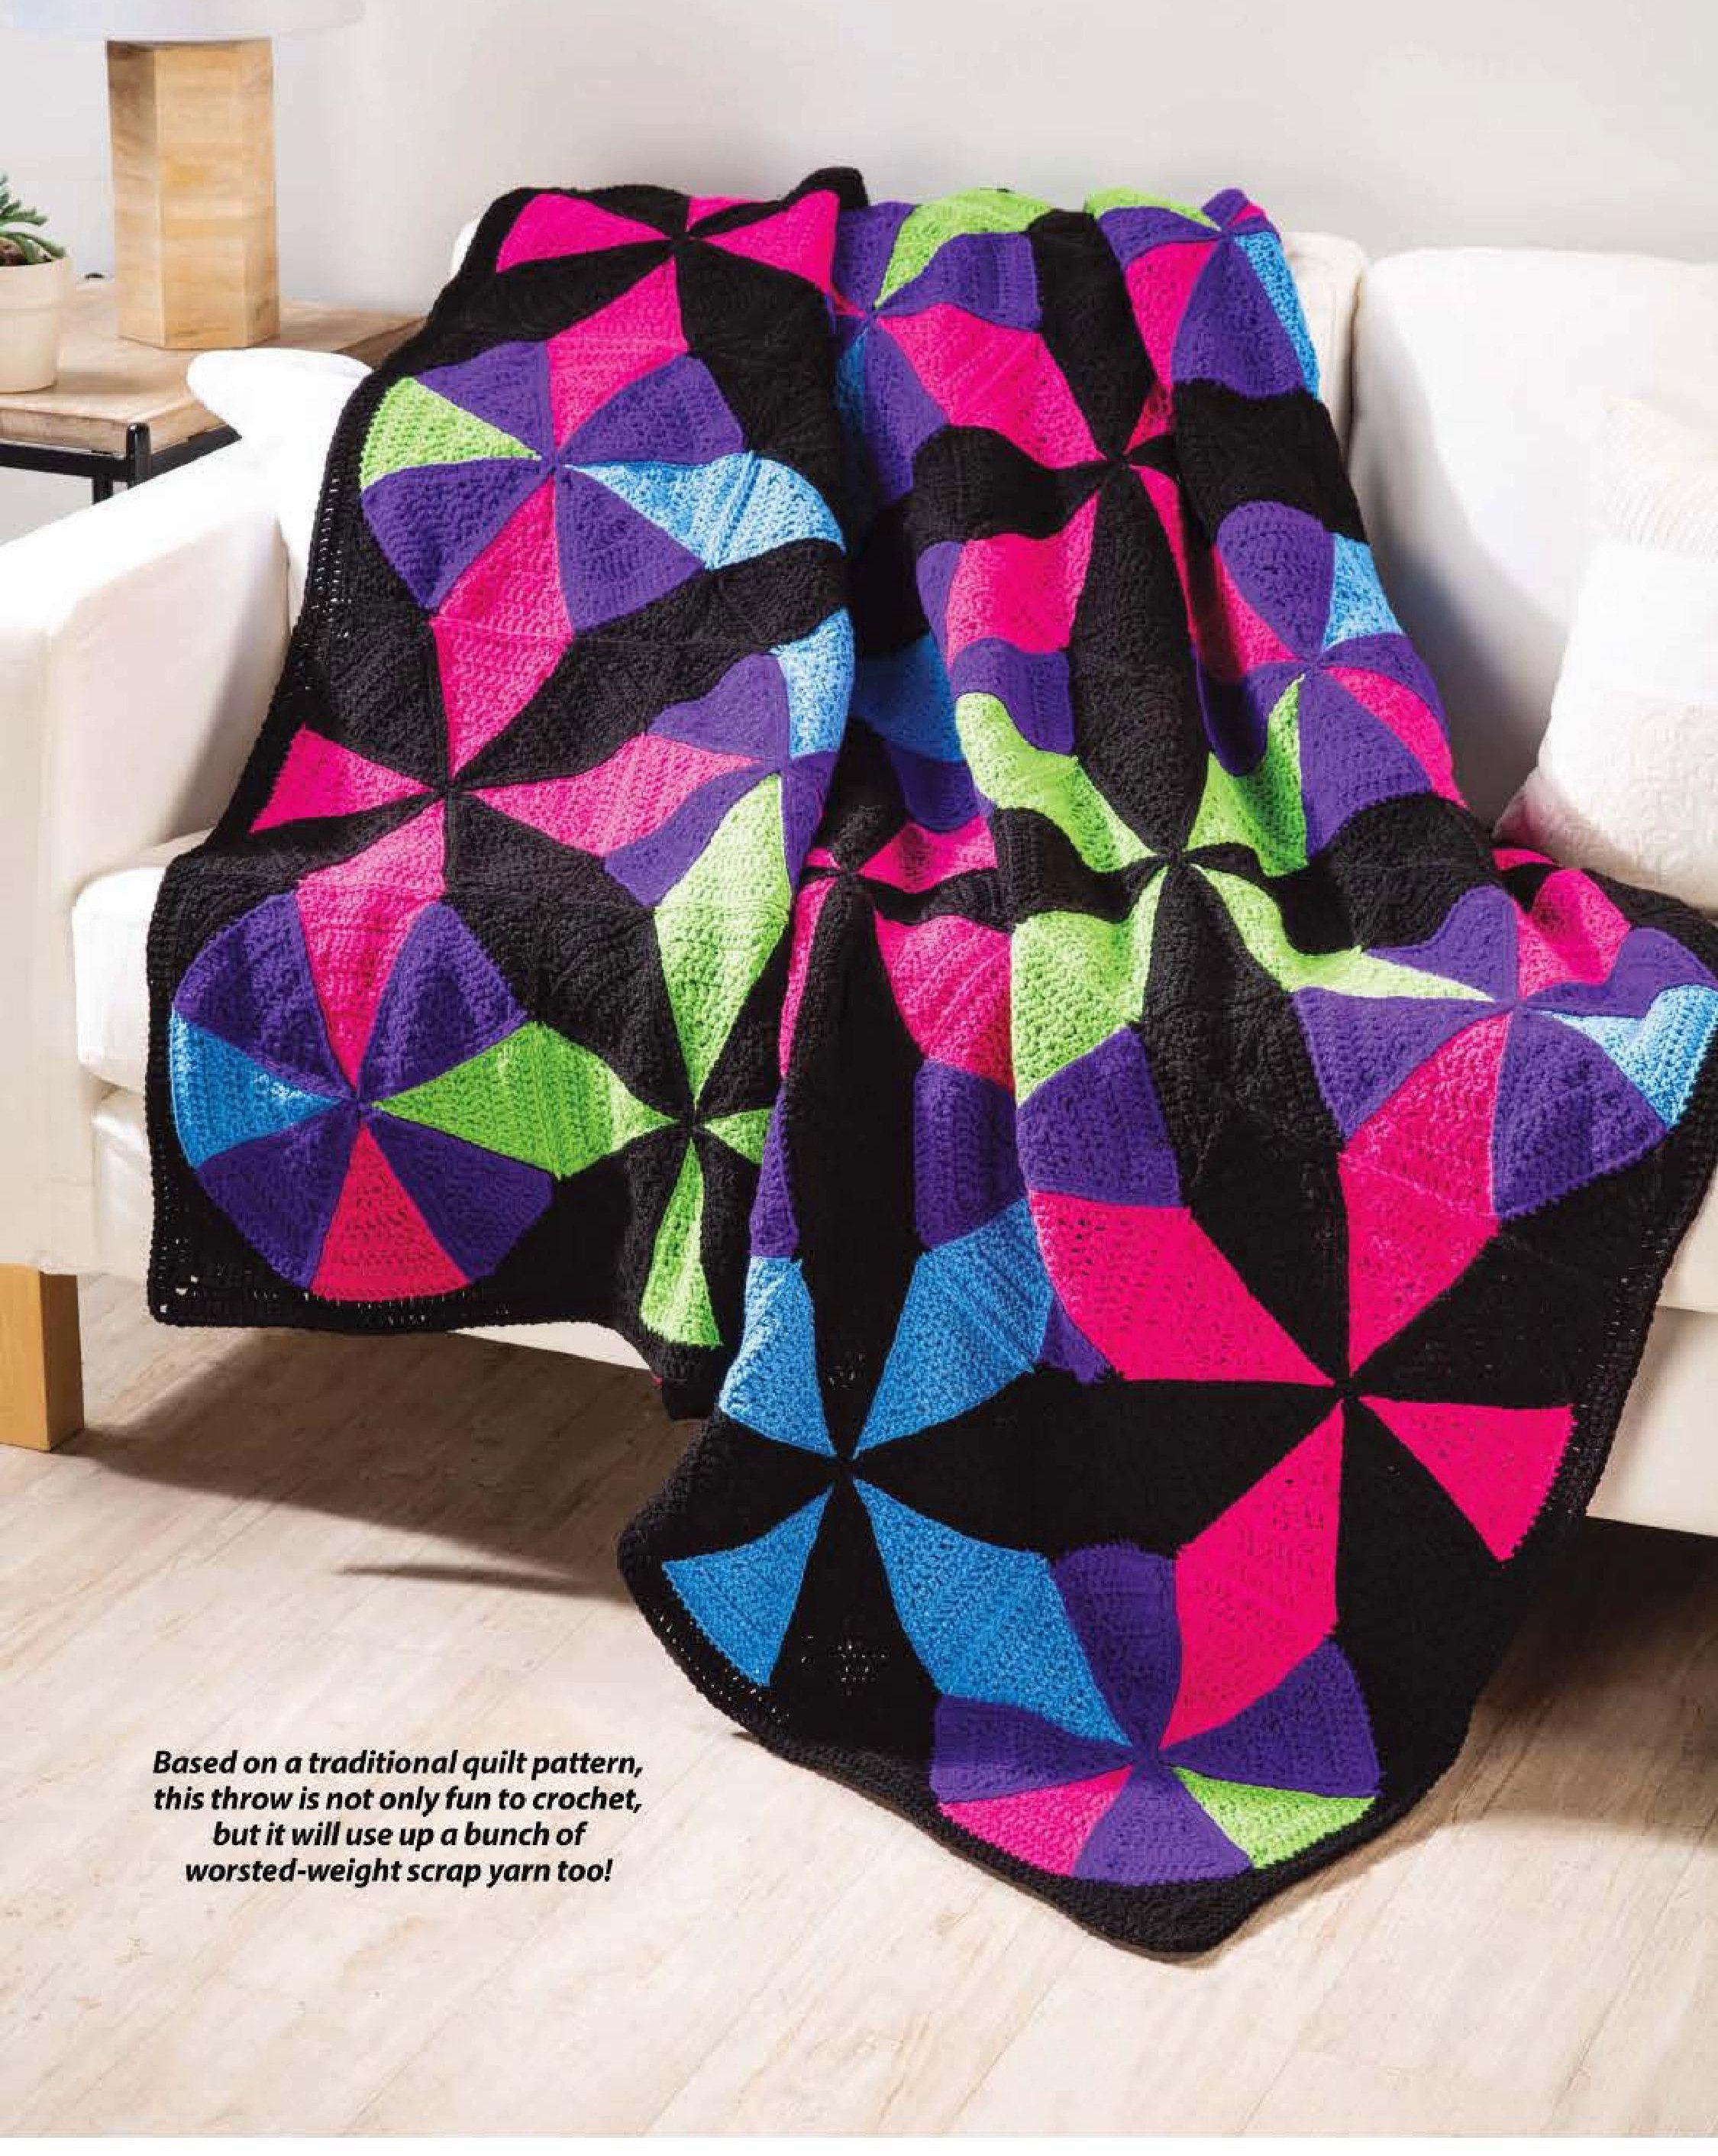 Crochet Blanket Pattern UK - Kaleidoscope Throw, Crochet